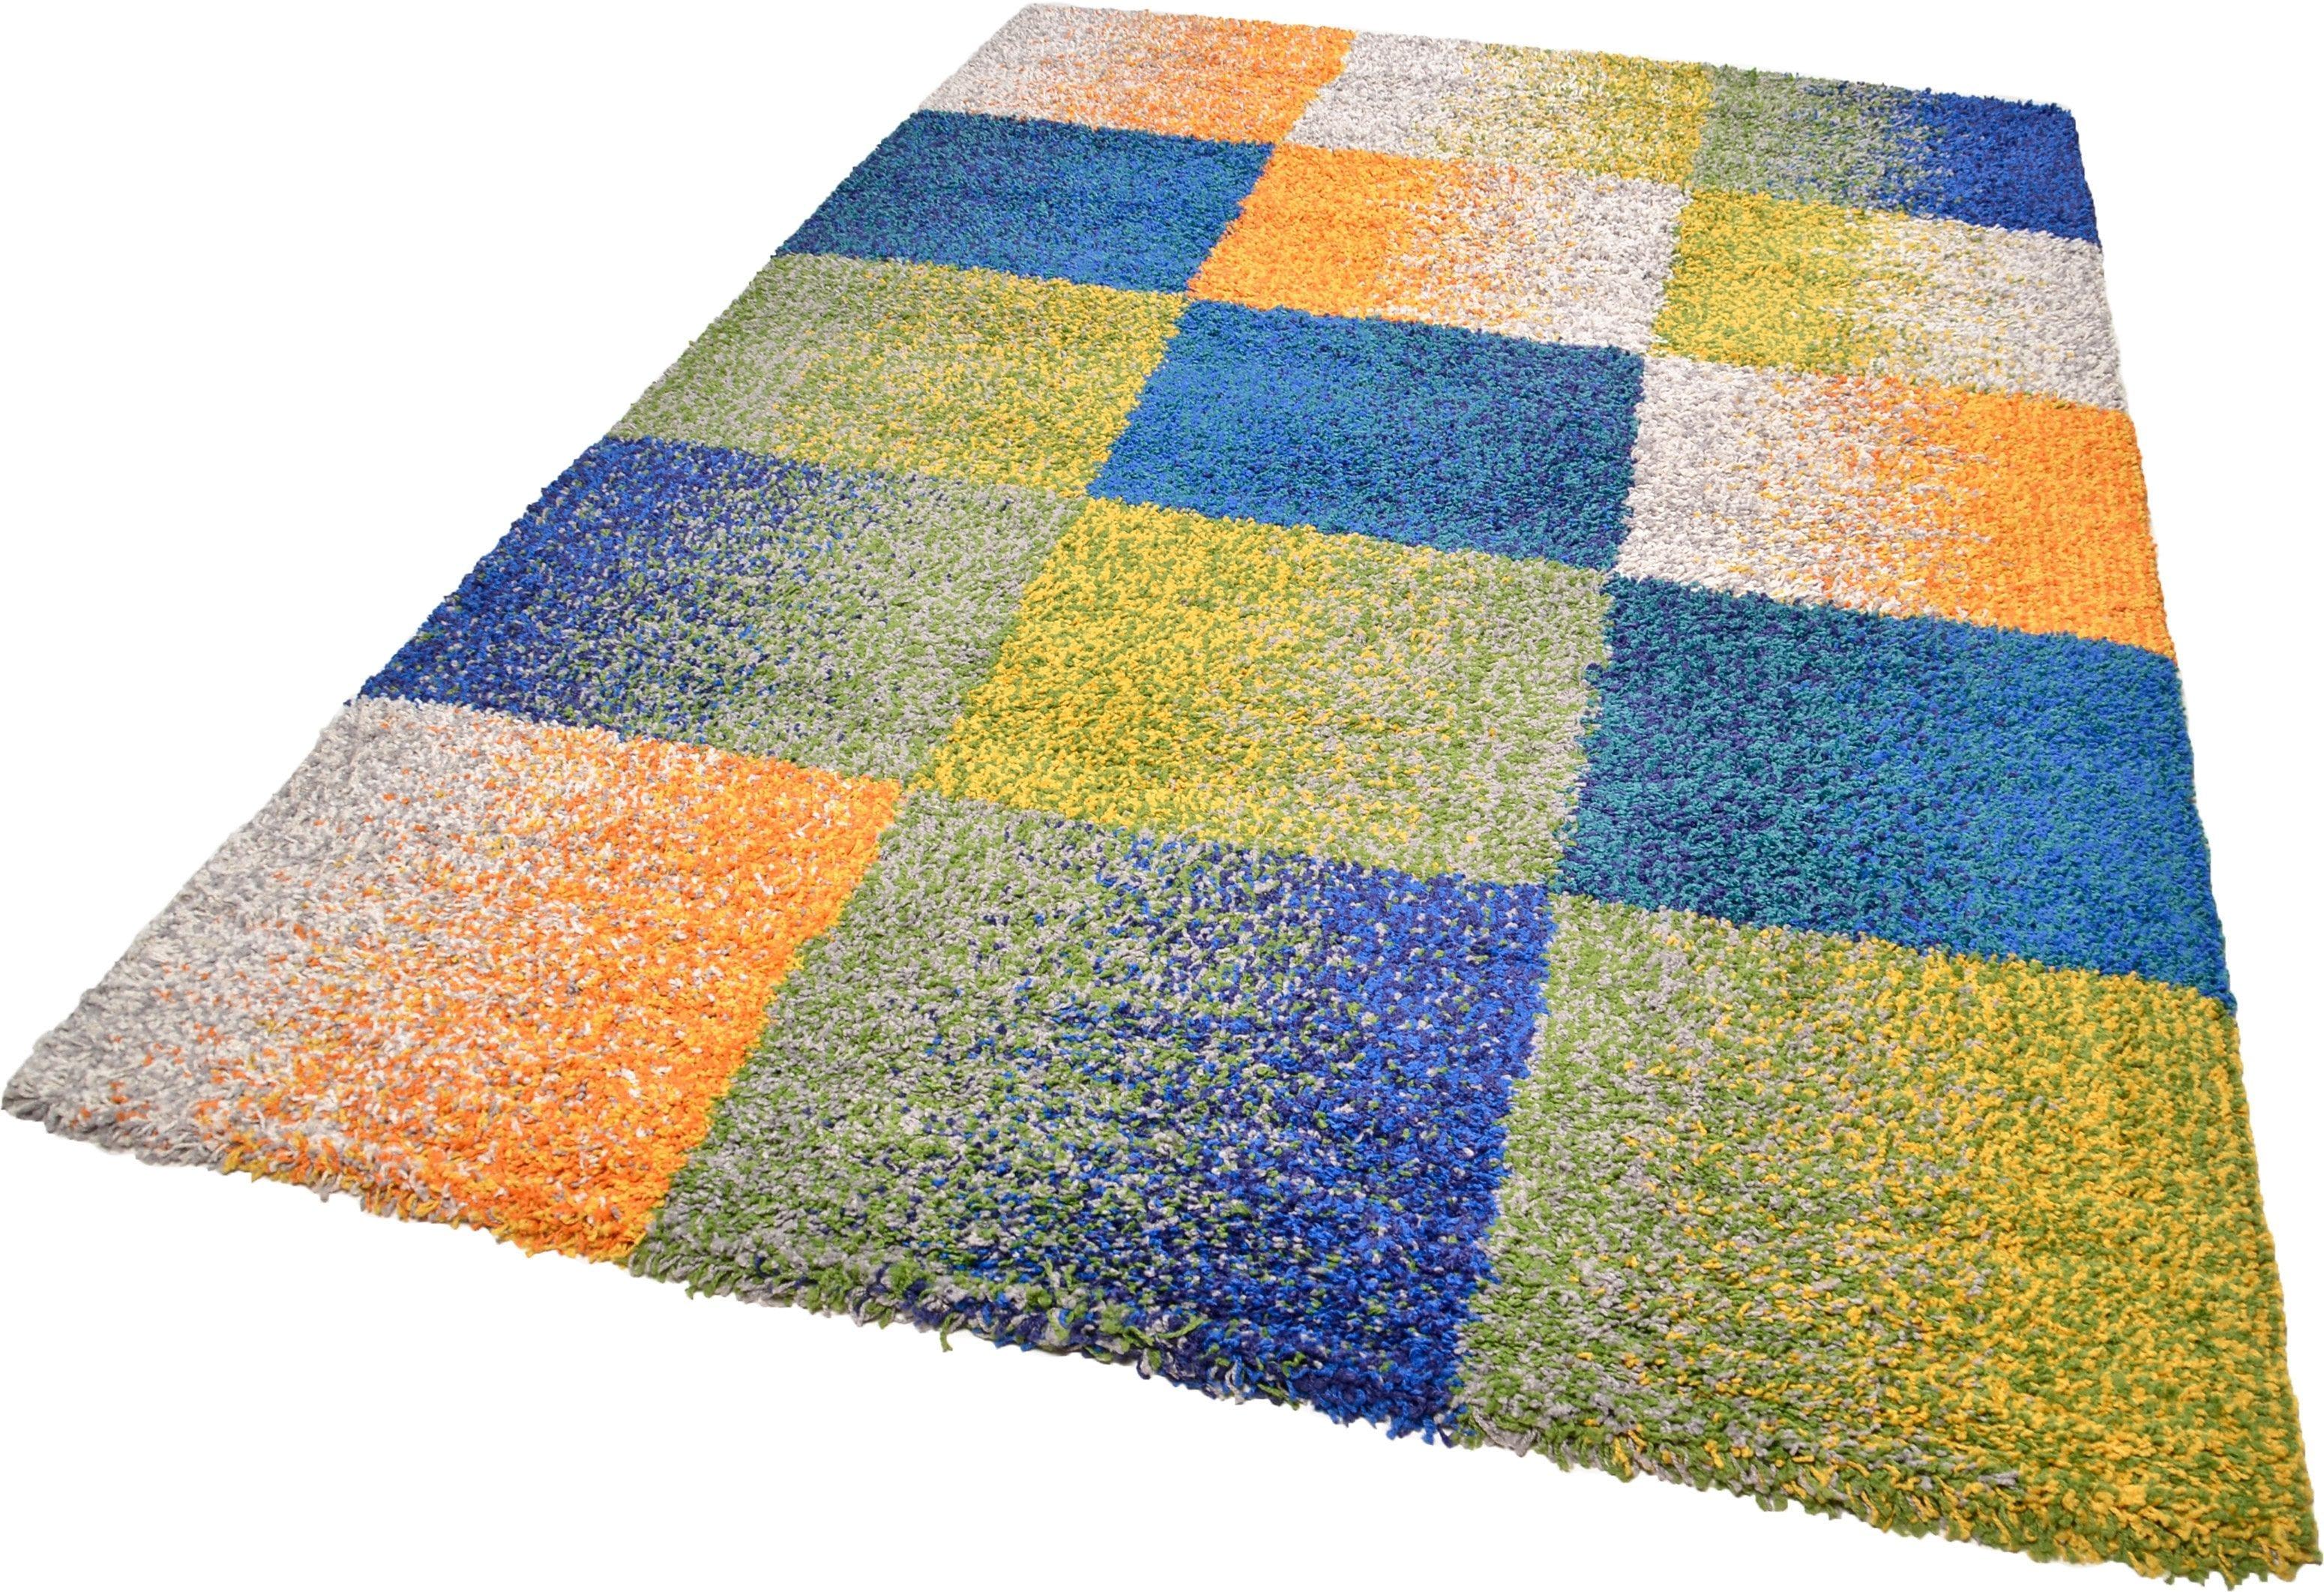 Hochflor-Teppich Color Shaggy 114 THEKO rechteckig Höhe 35 mm handgewebt